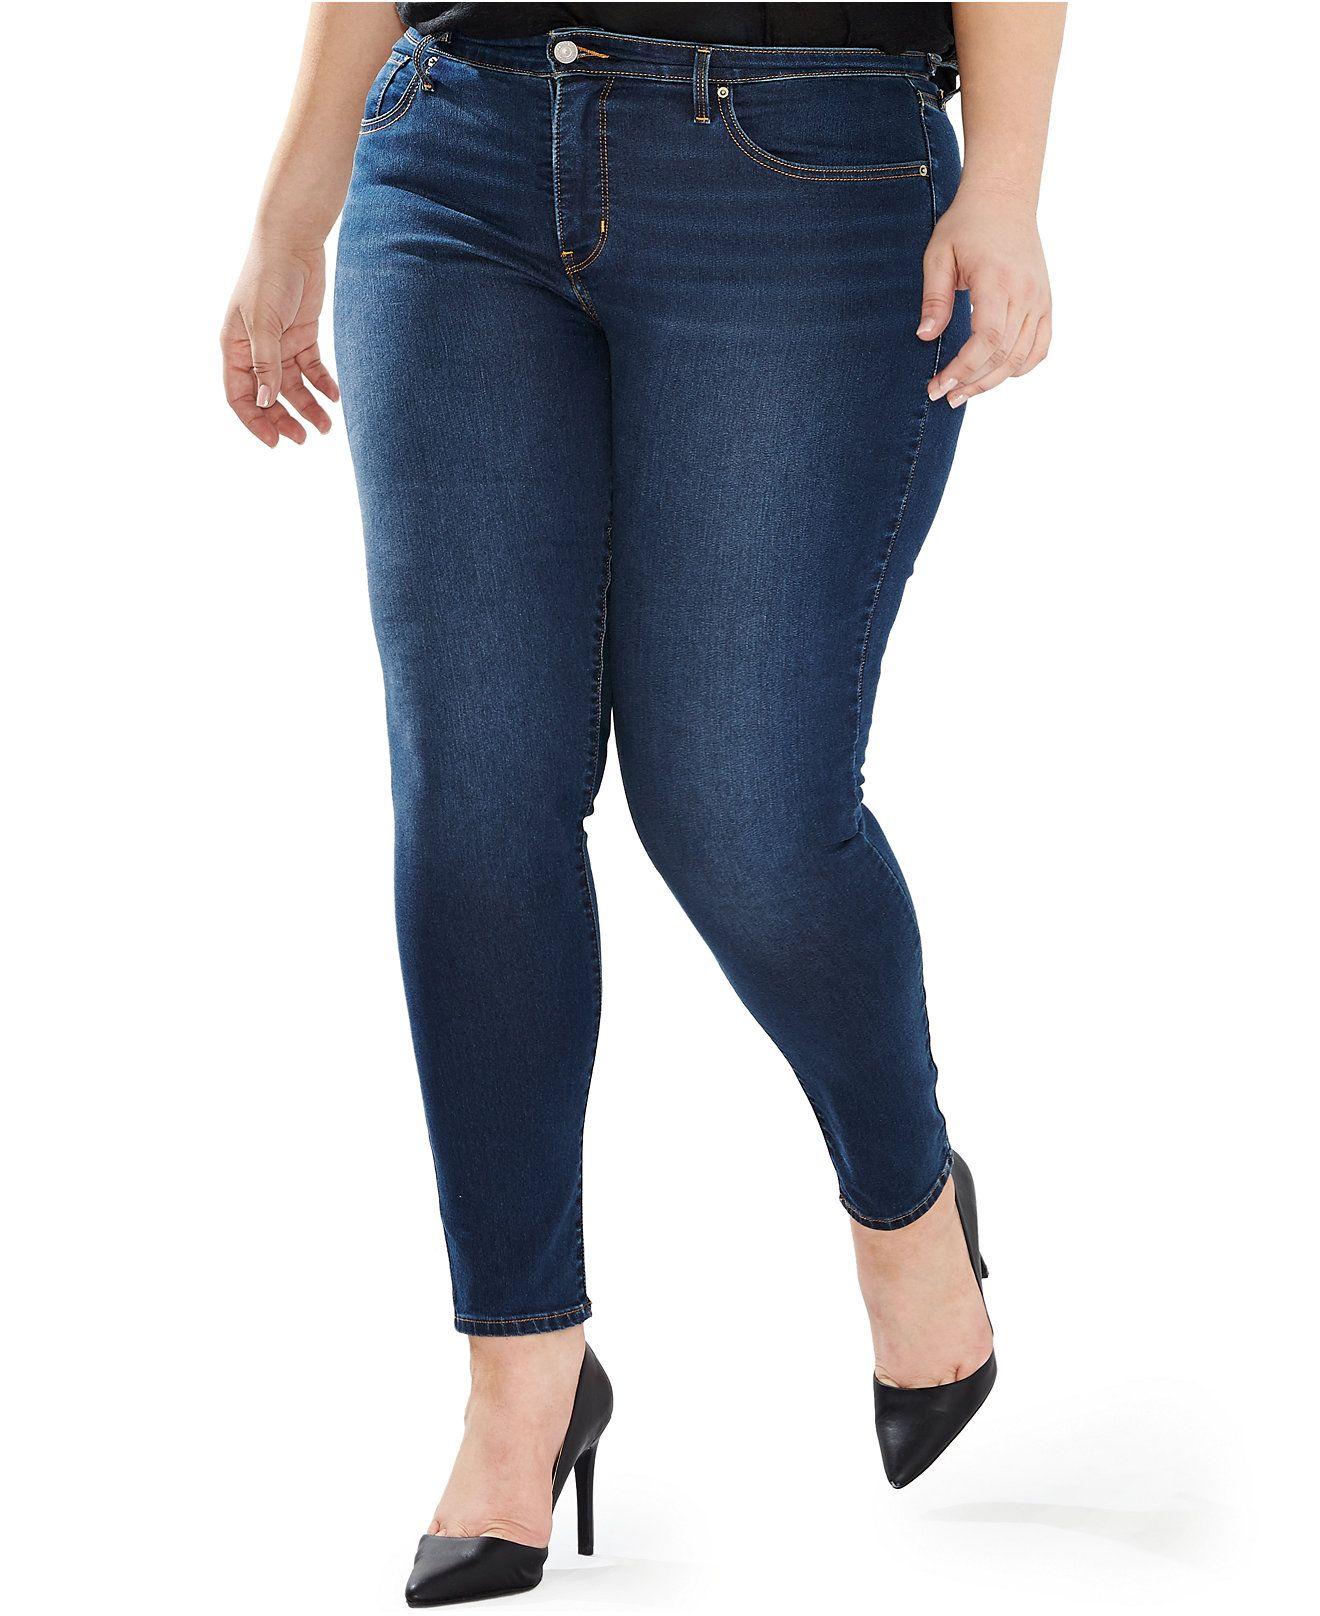 9c92de07aa1ad Levi s Plus Size 310 Shaping Super Skinny - Jeans - Plus Sizes - Macy s